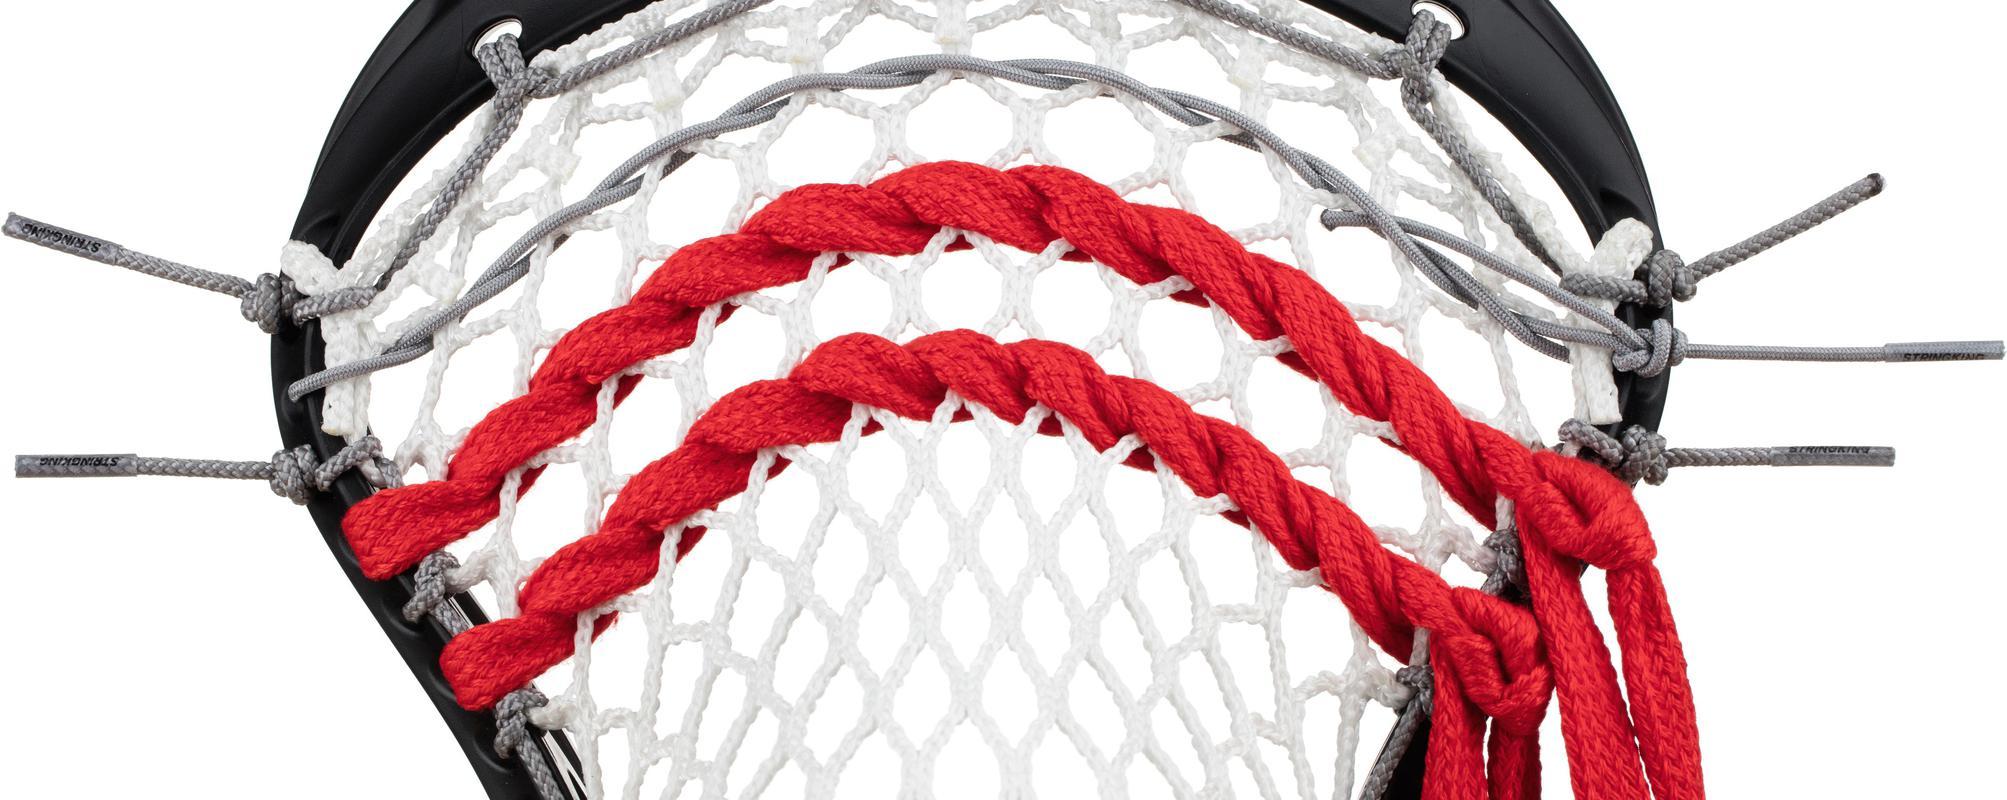 StringKing Lacrosse Mesh Stringing Supplies Shooting Laces Strung Pocket